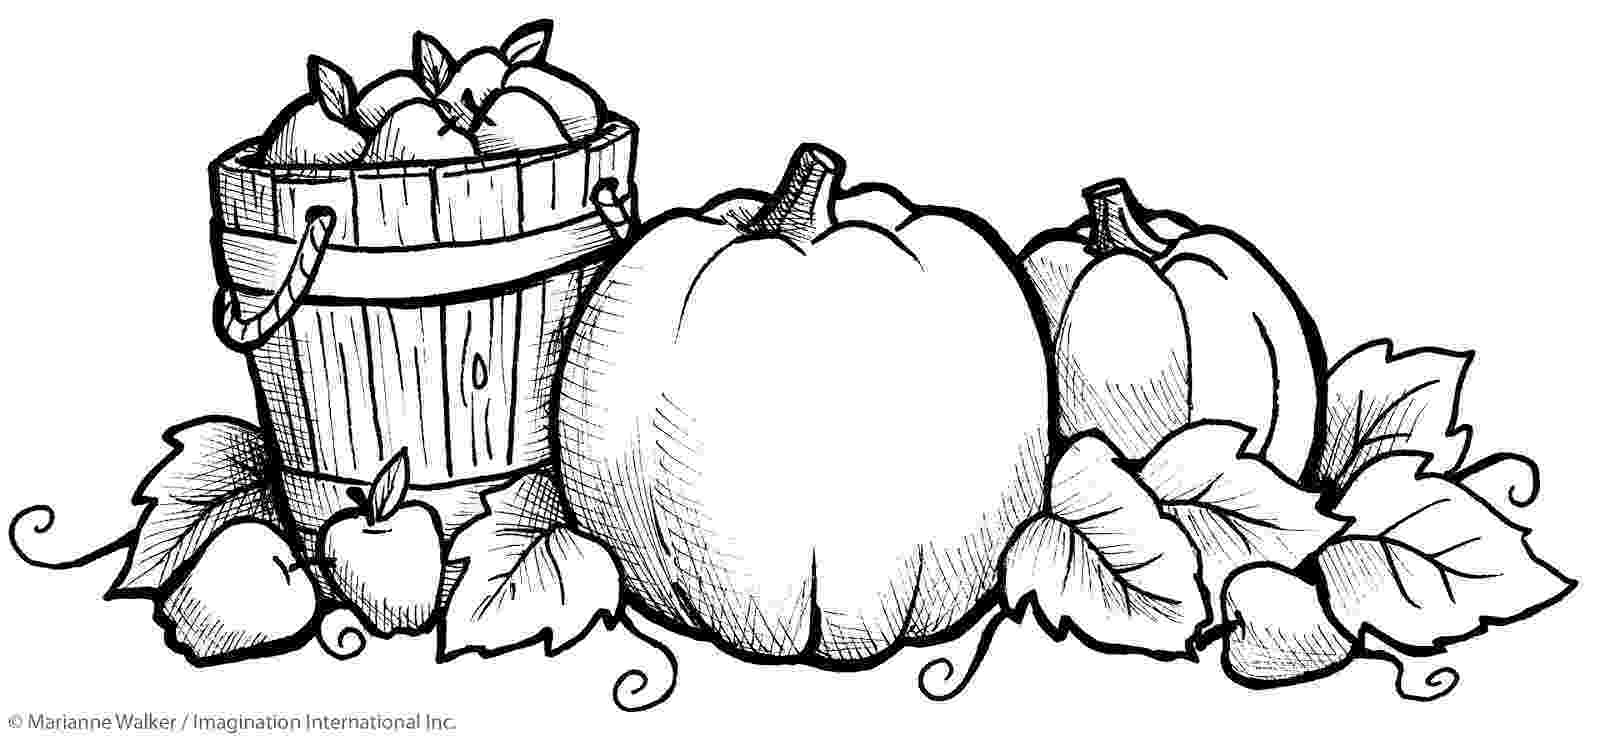 coloring pages pumpkins print free printable pumpkin coloring pages for kids pages print pumpkins coloring